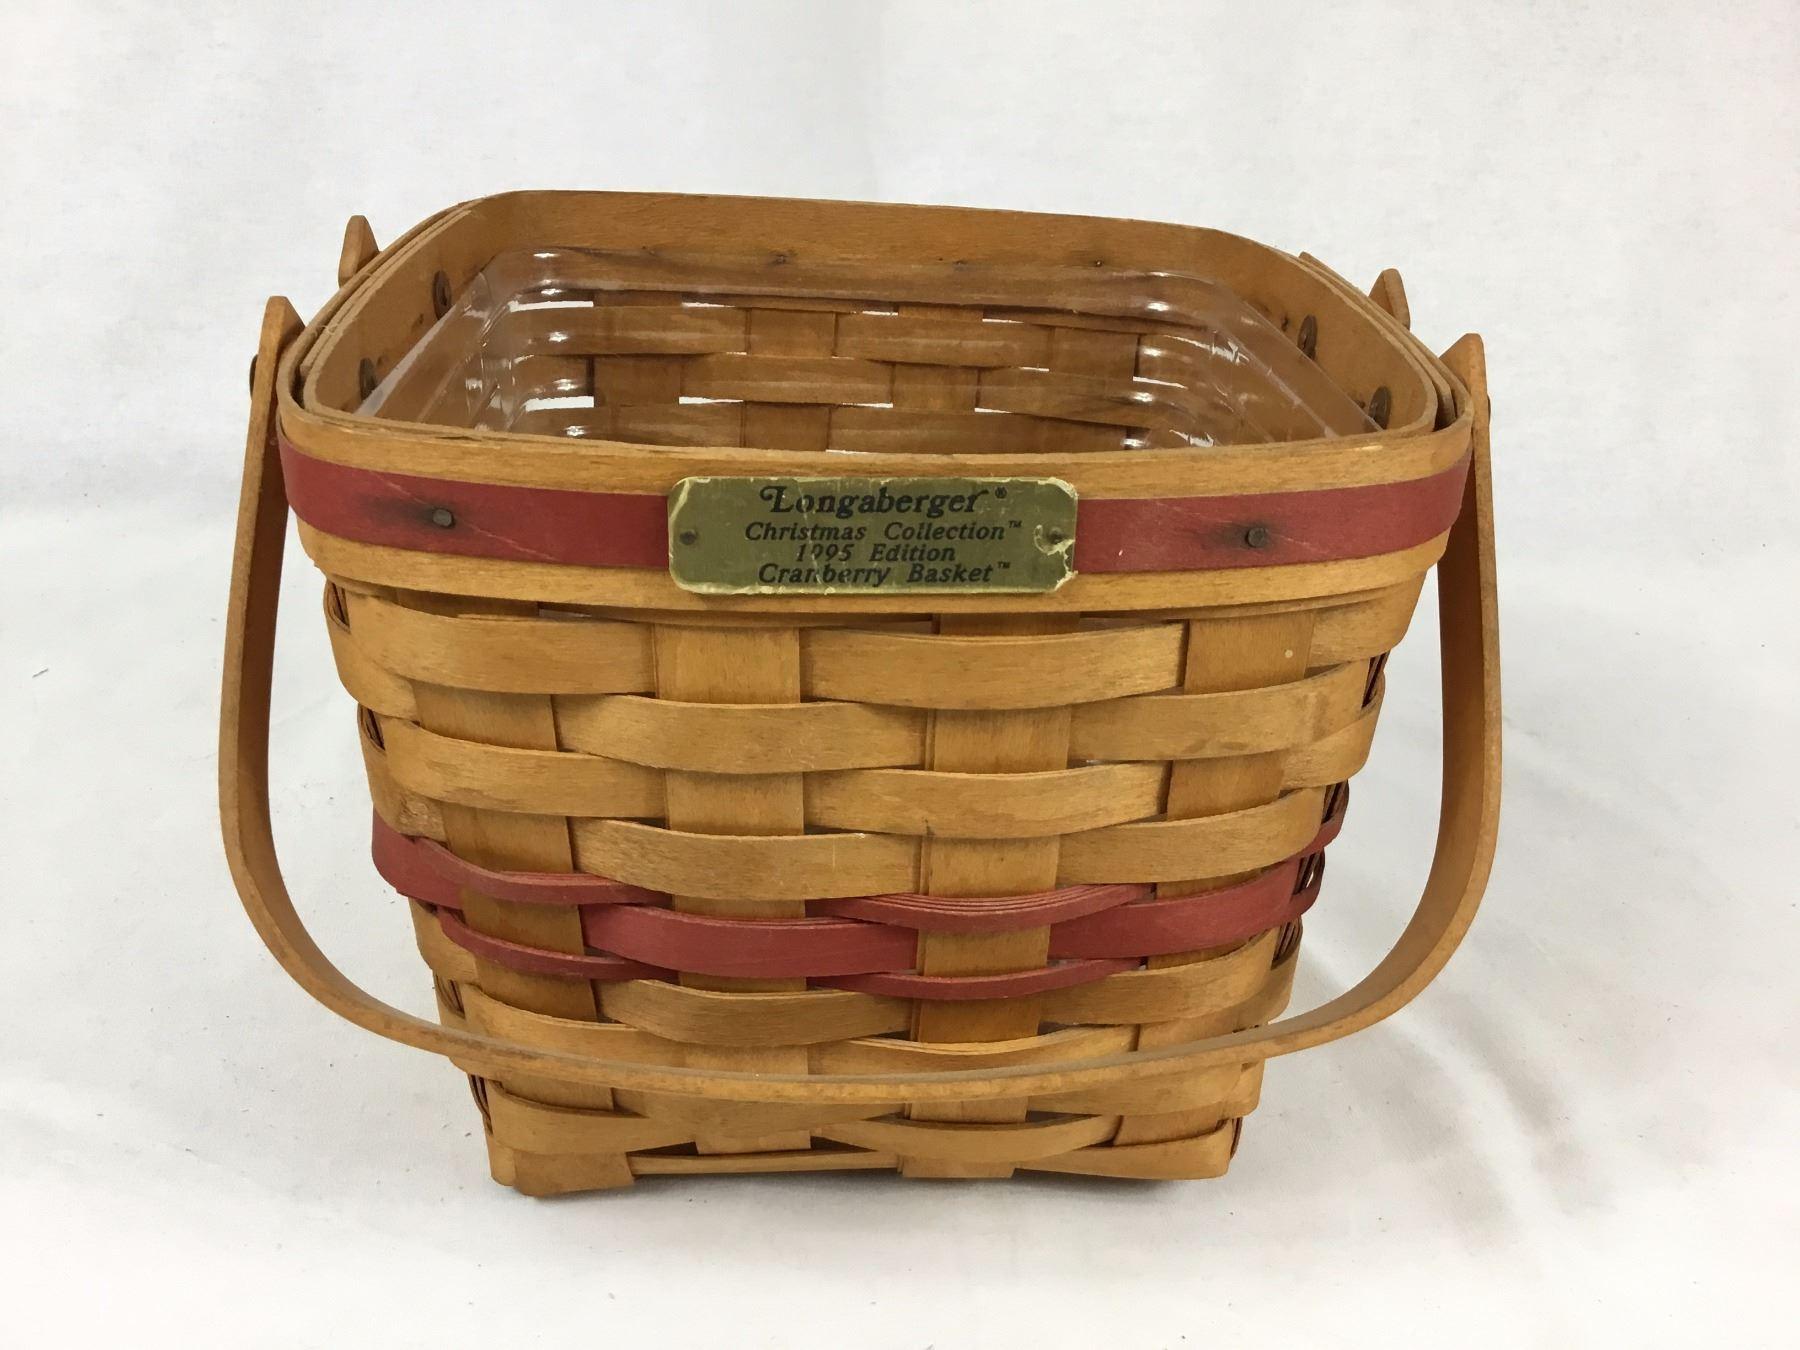 Longaberger Christmas Basket.Longaberger 1995 Christmas Collection Cranberry Basket